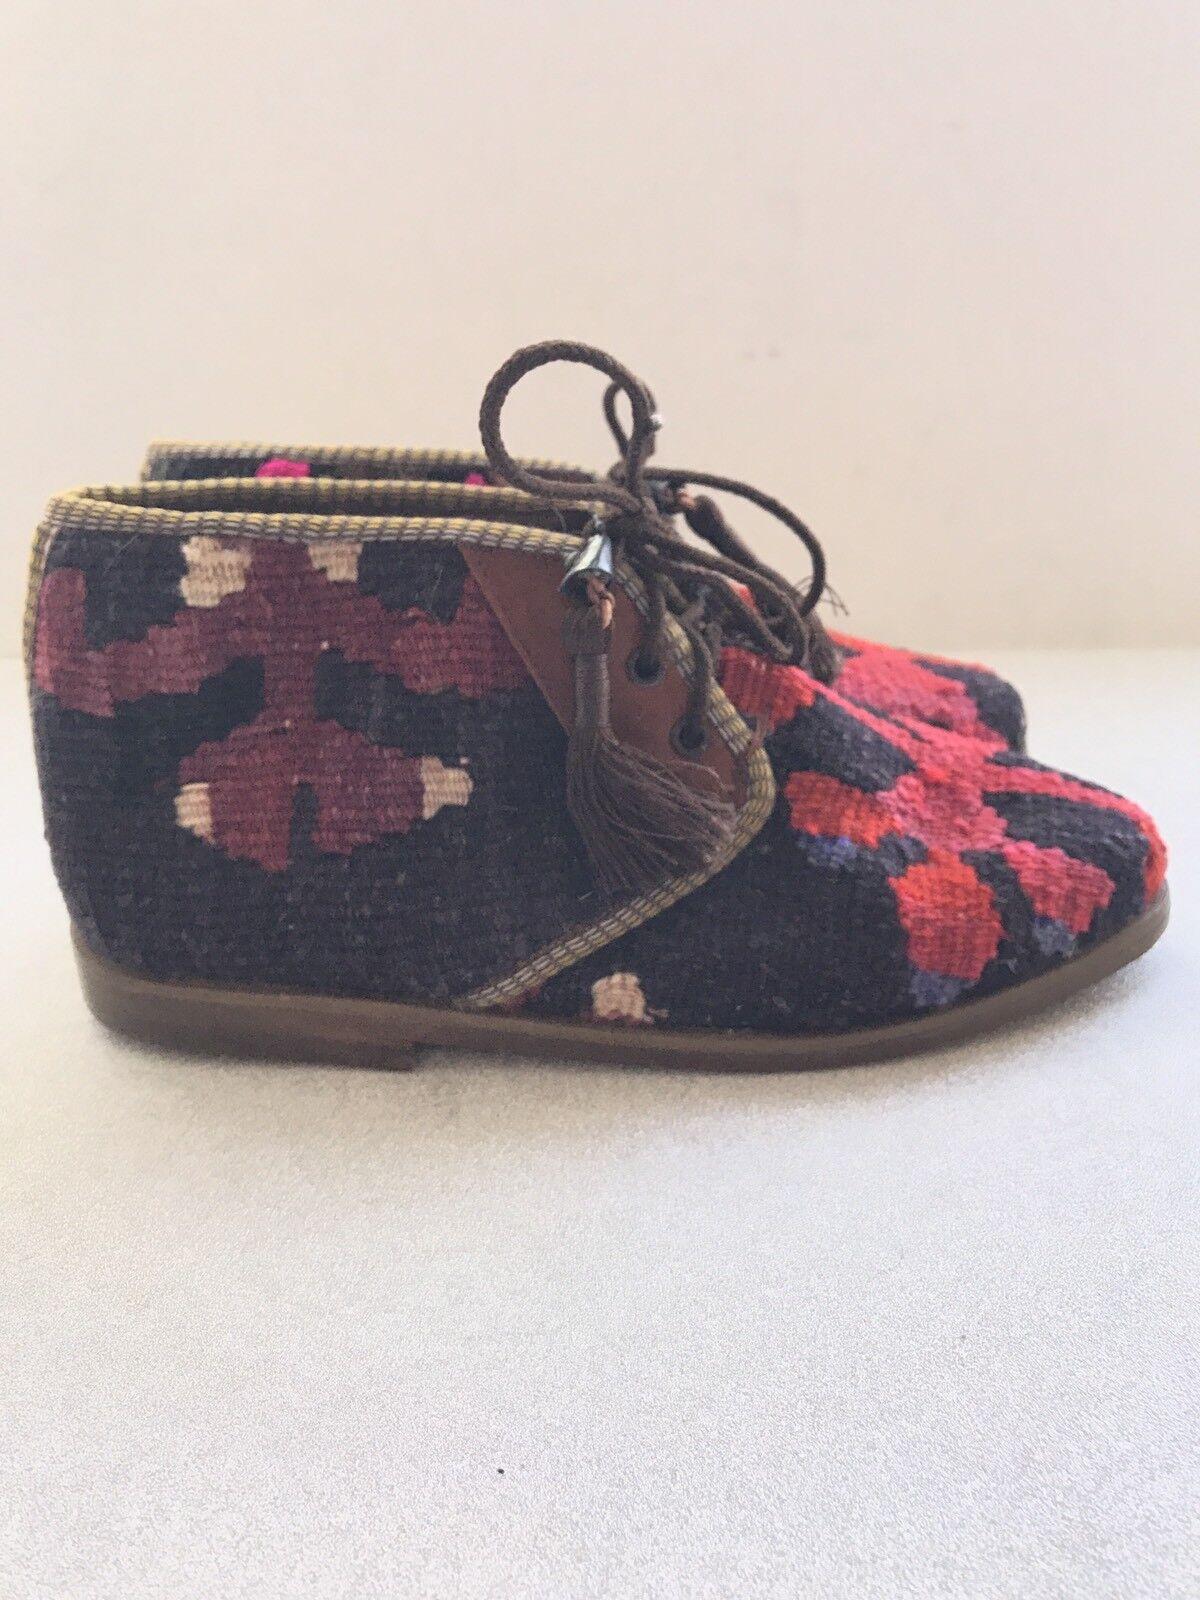 Topkapi turquie Kilim Kilim Kilim Tapis Bottines Semelles en Cuir Art to wear taille 6-6.5 19b4ab